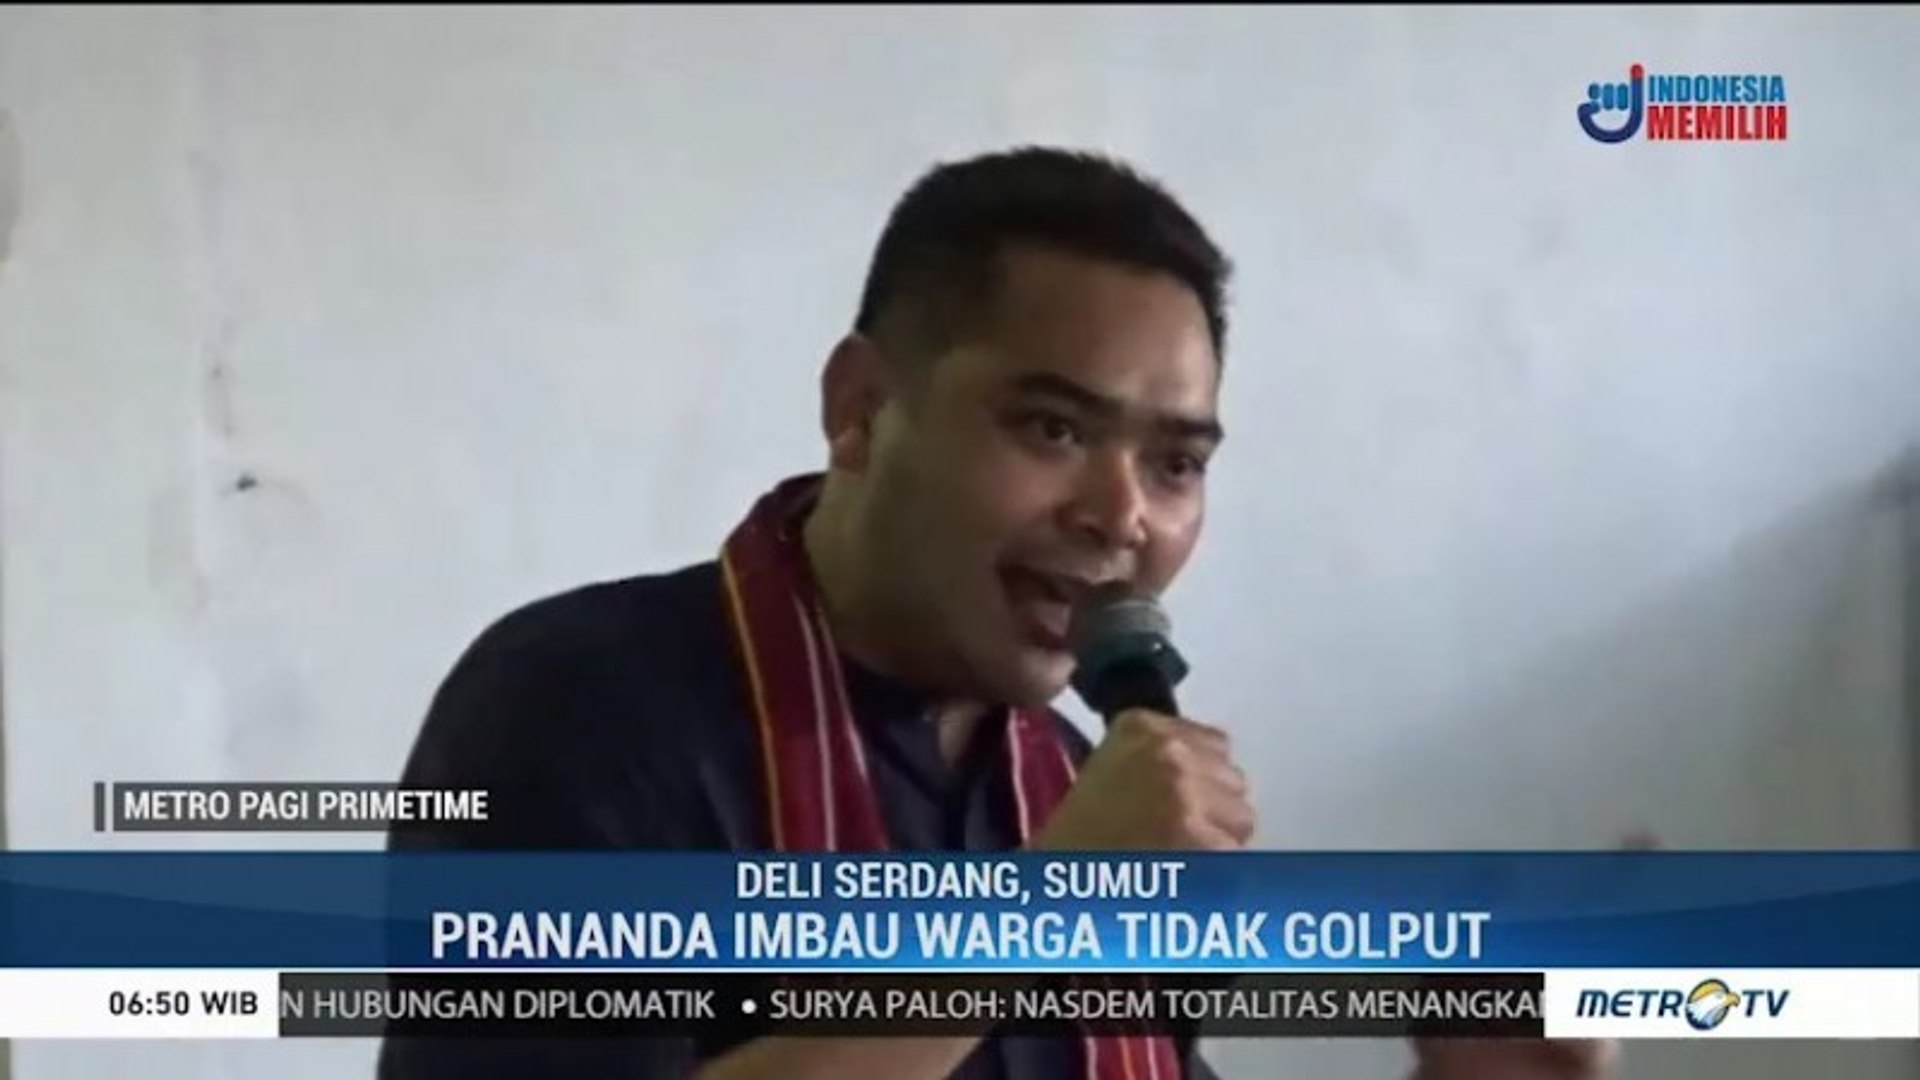 Prananda Paloh Sosialisasi Cara Mencoblos di Deli Serdang